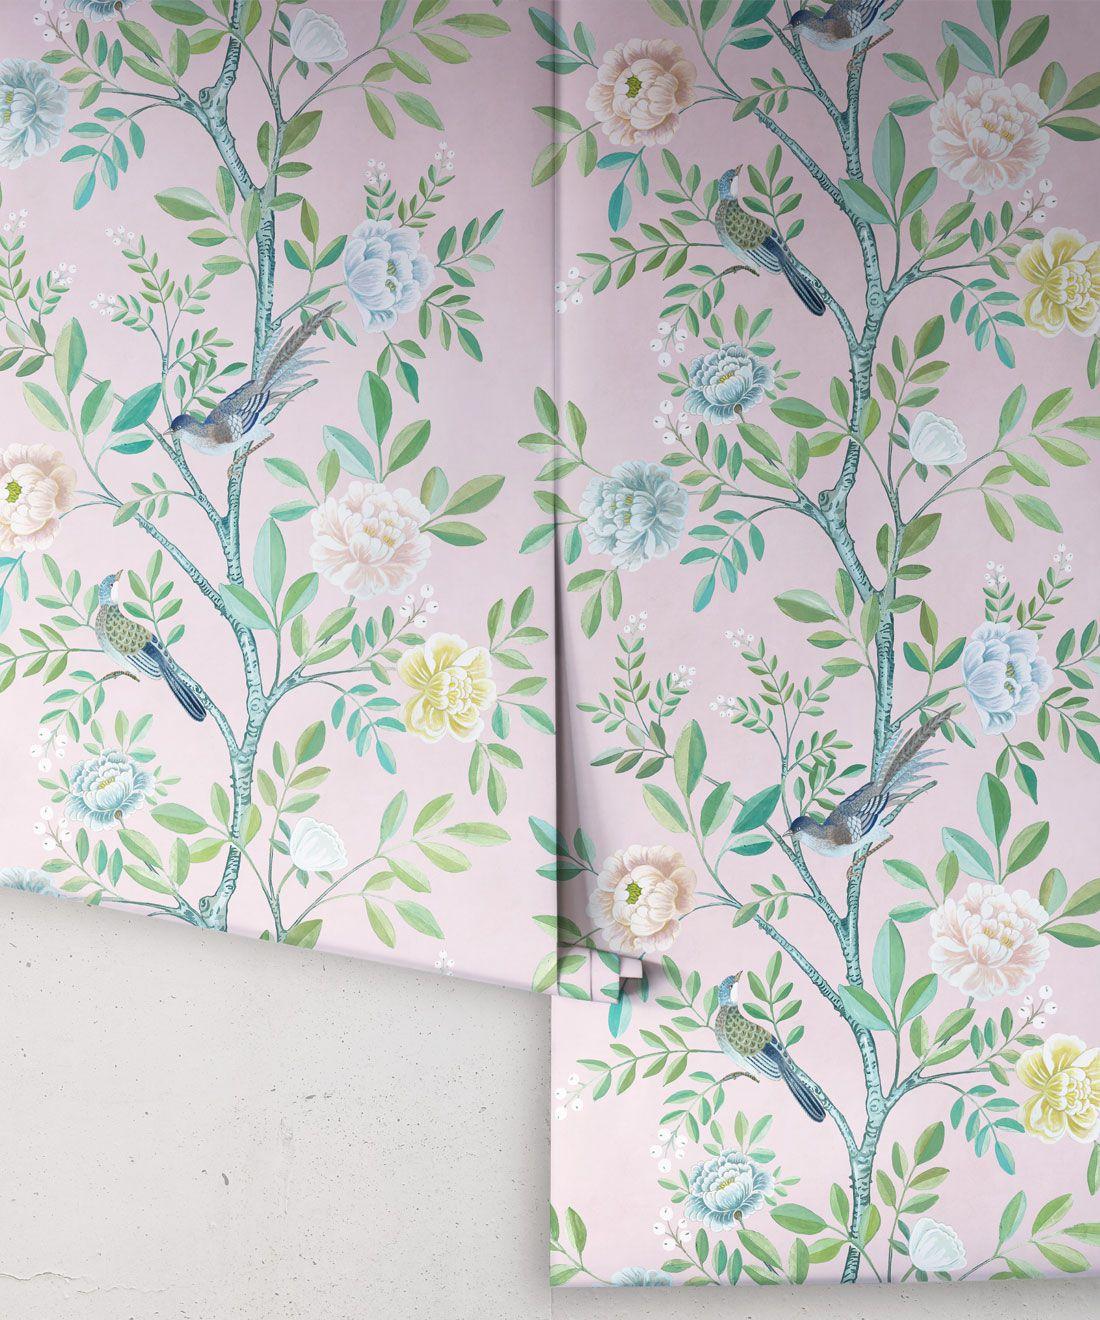 Chinoiserie Wallpaper •Floral Wallpaper •Bird Wallpaper • Magnolia • Blush • Rolls